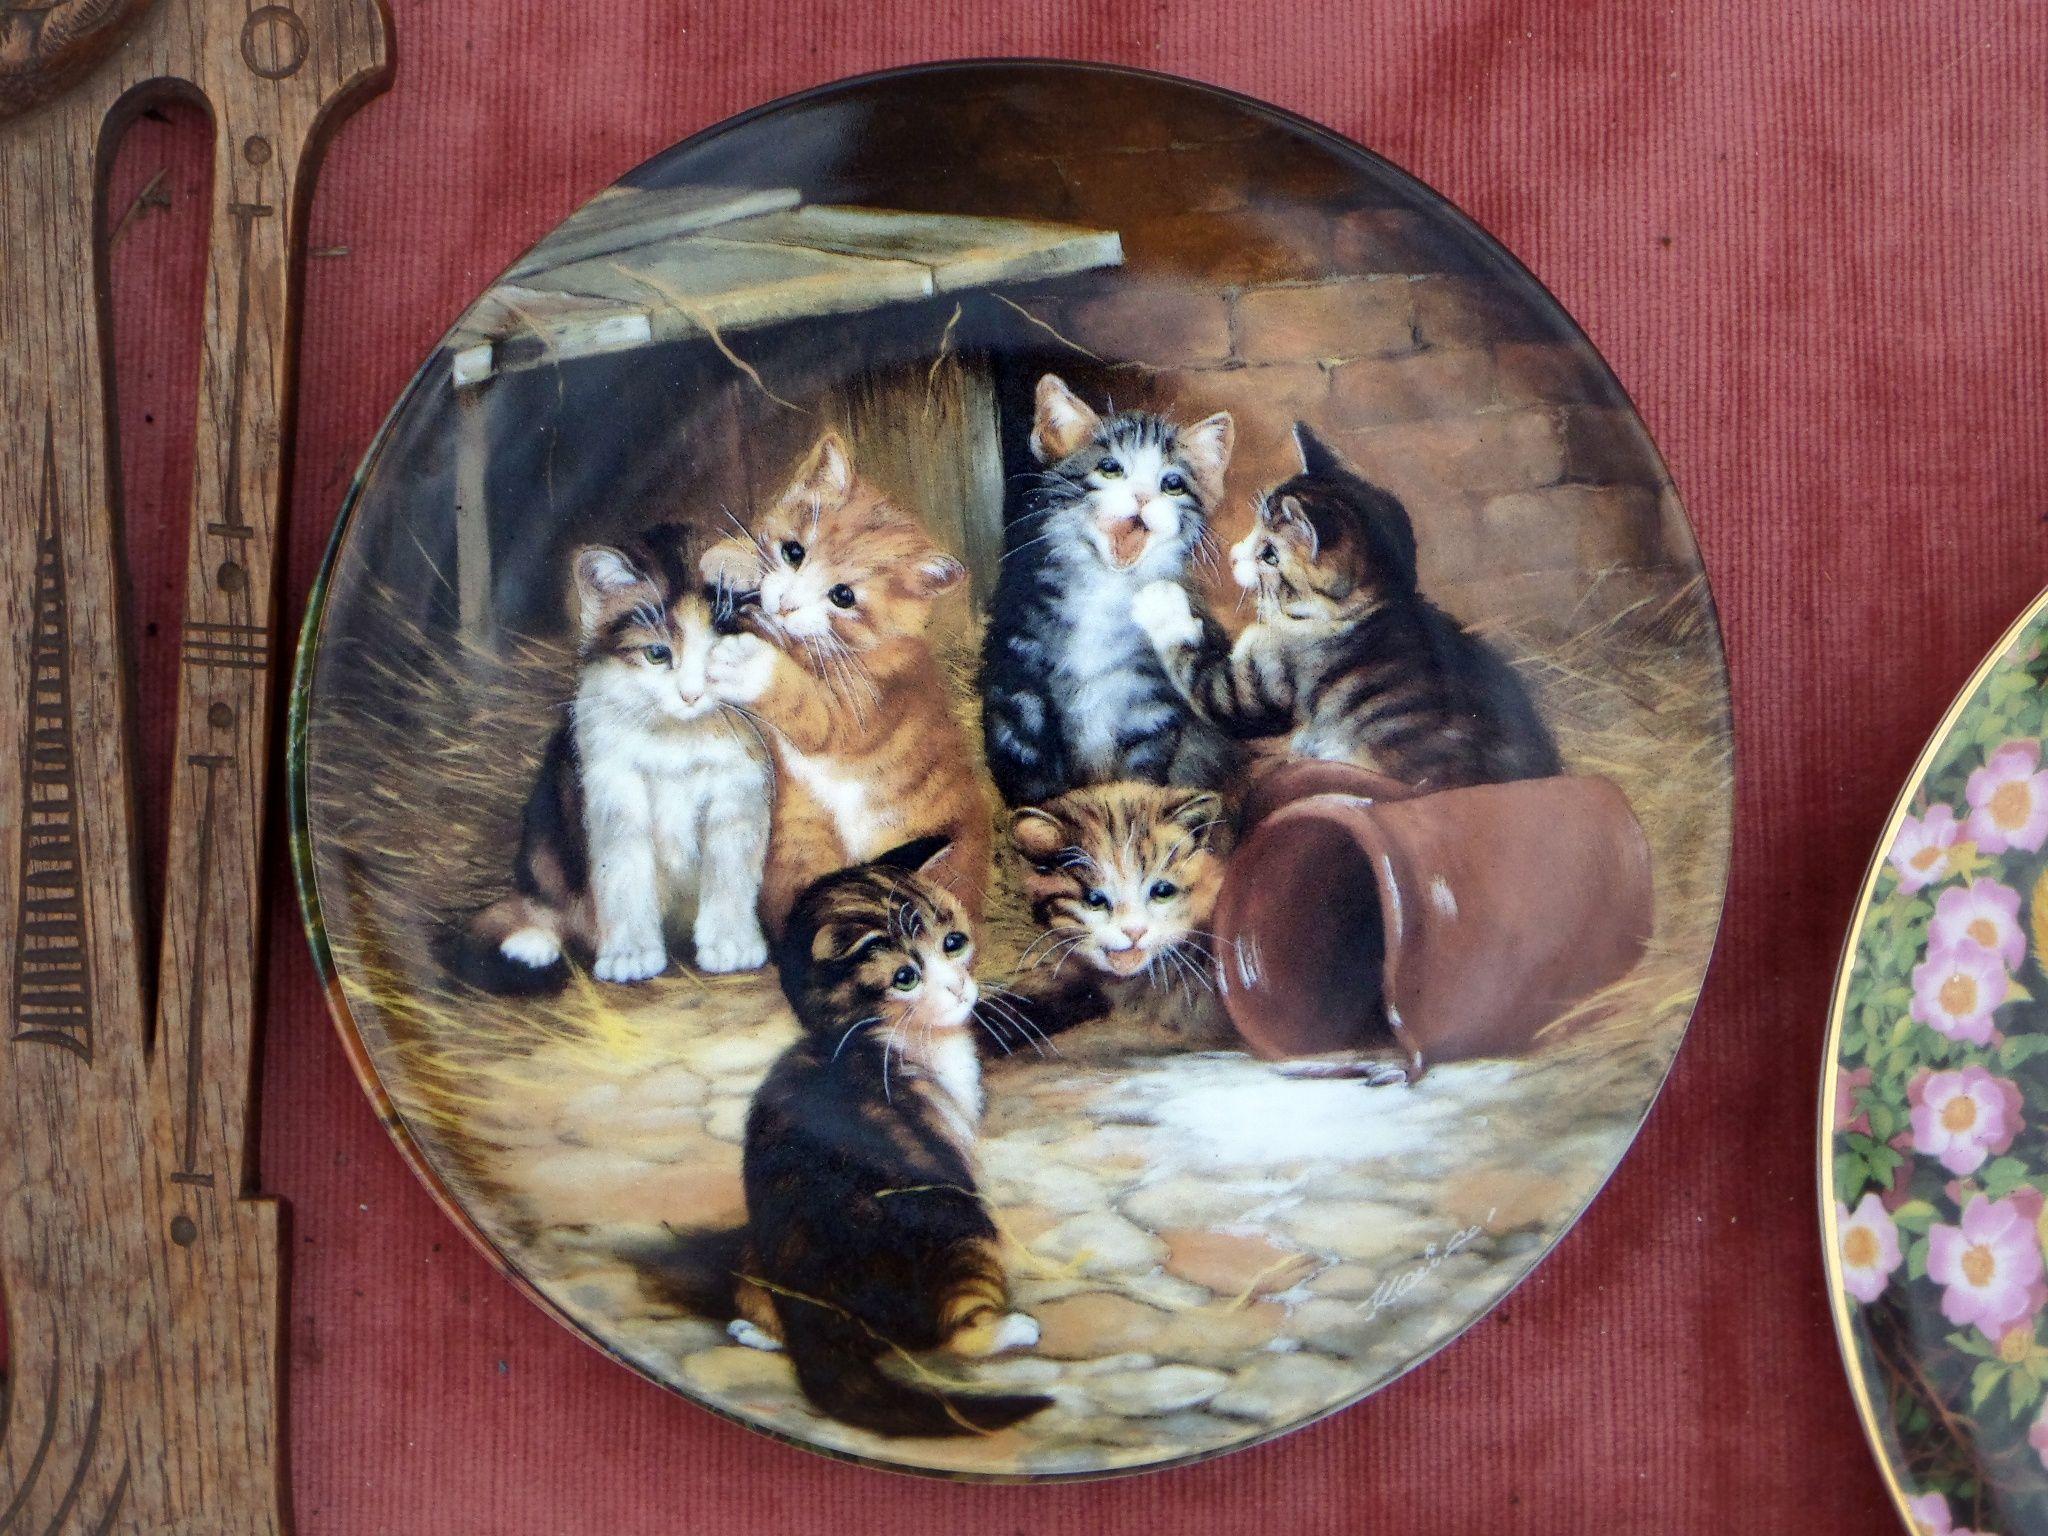 Kittens on the plate by Grzegorz Adamski on 500px